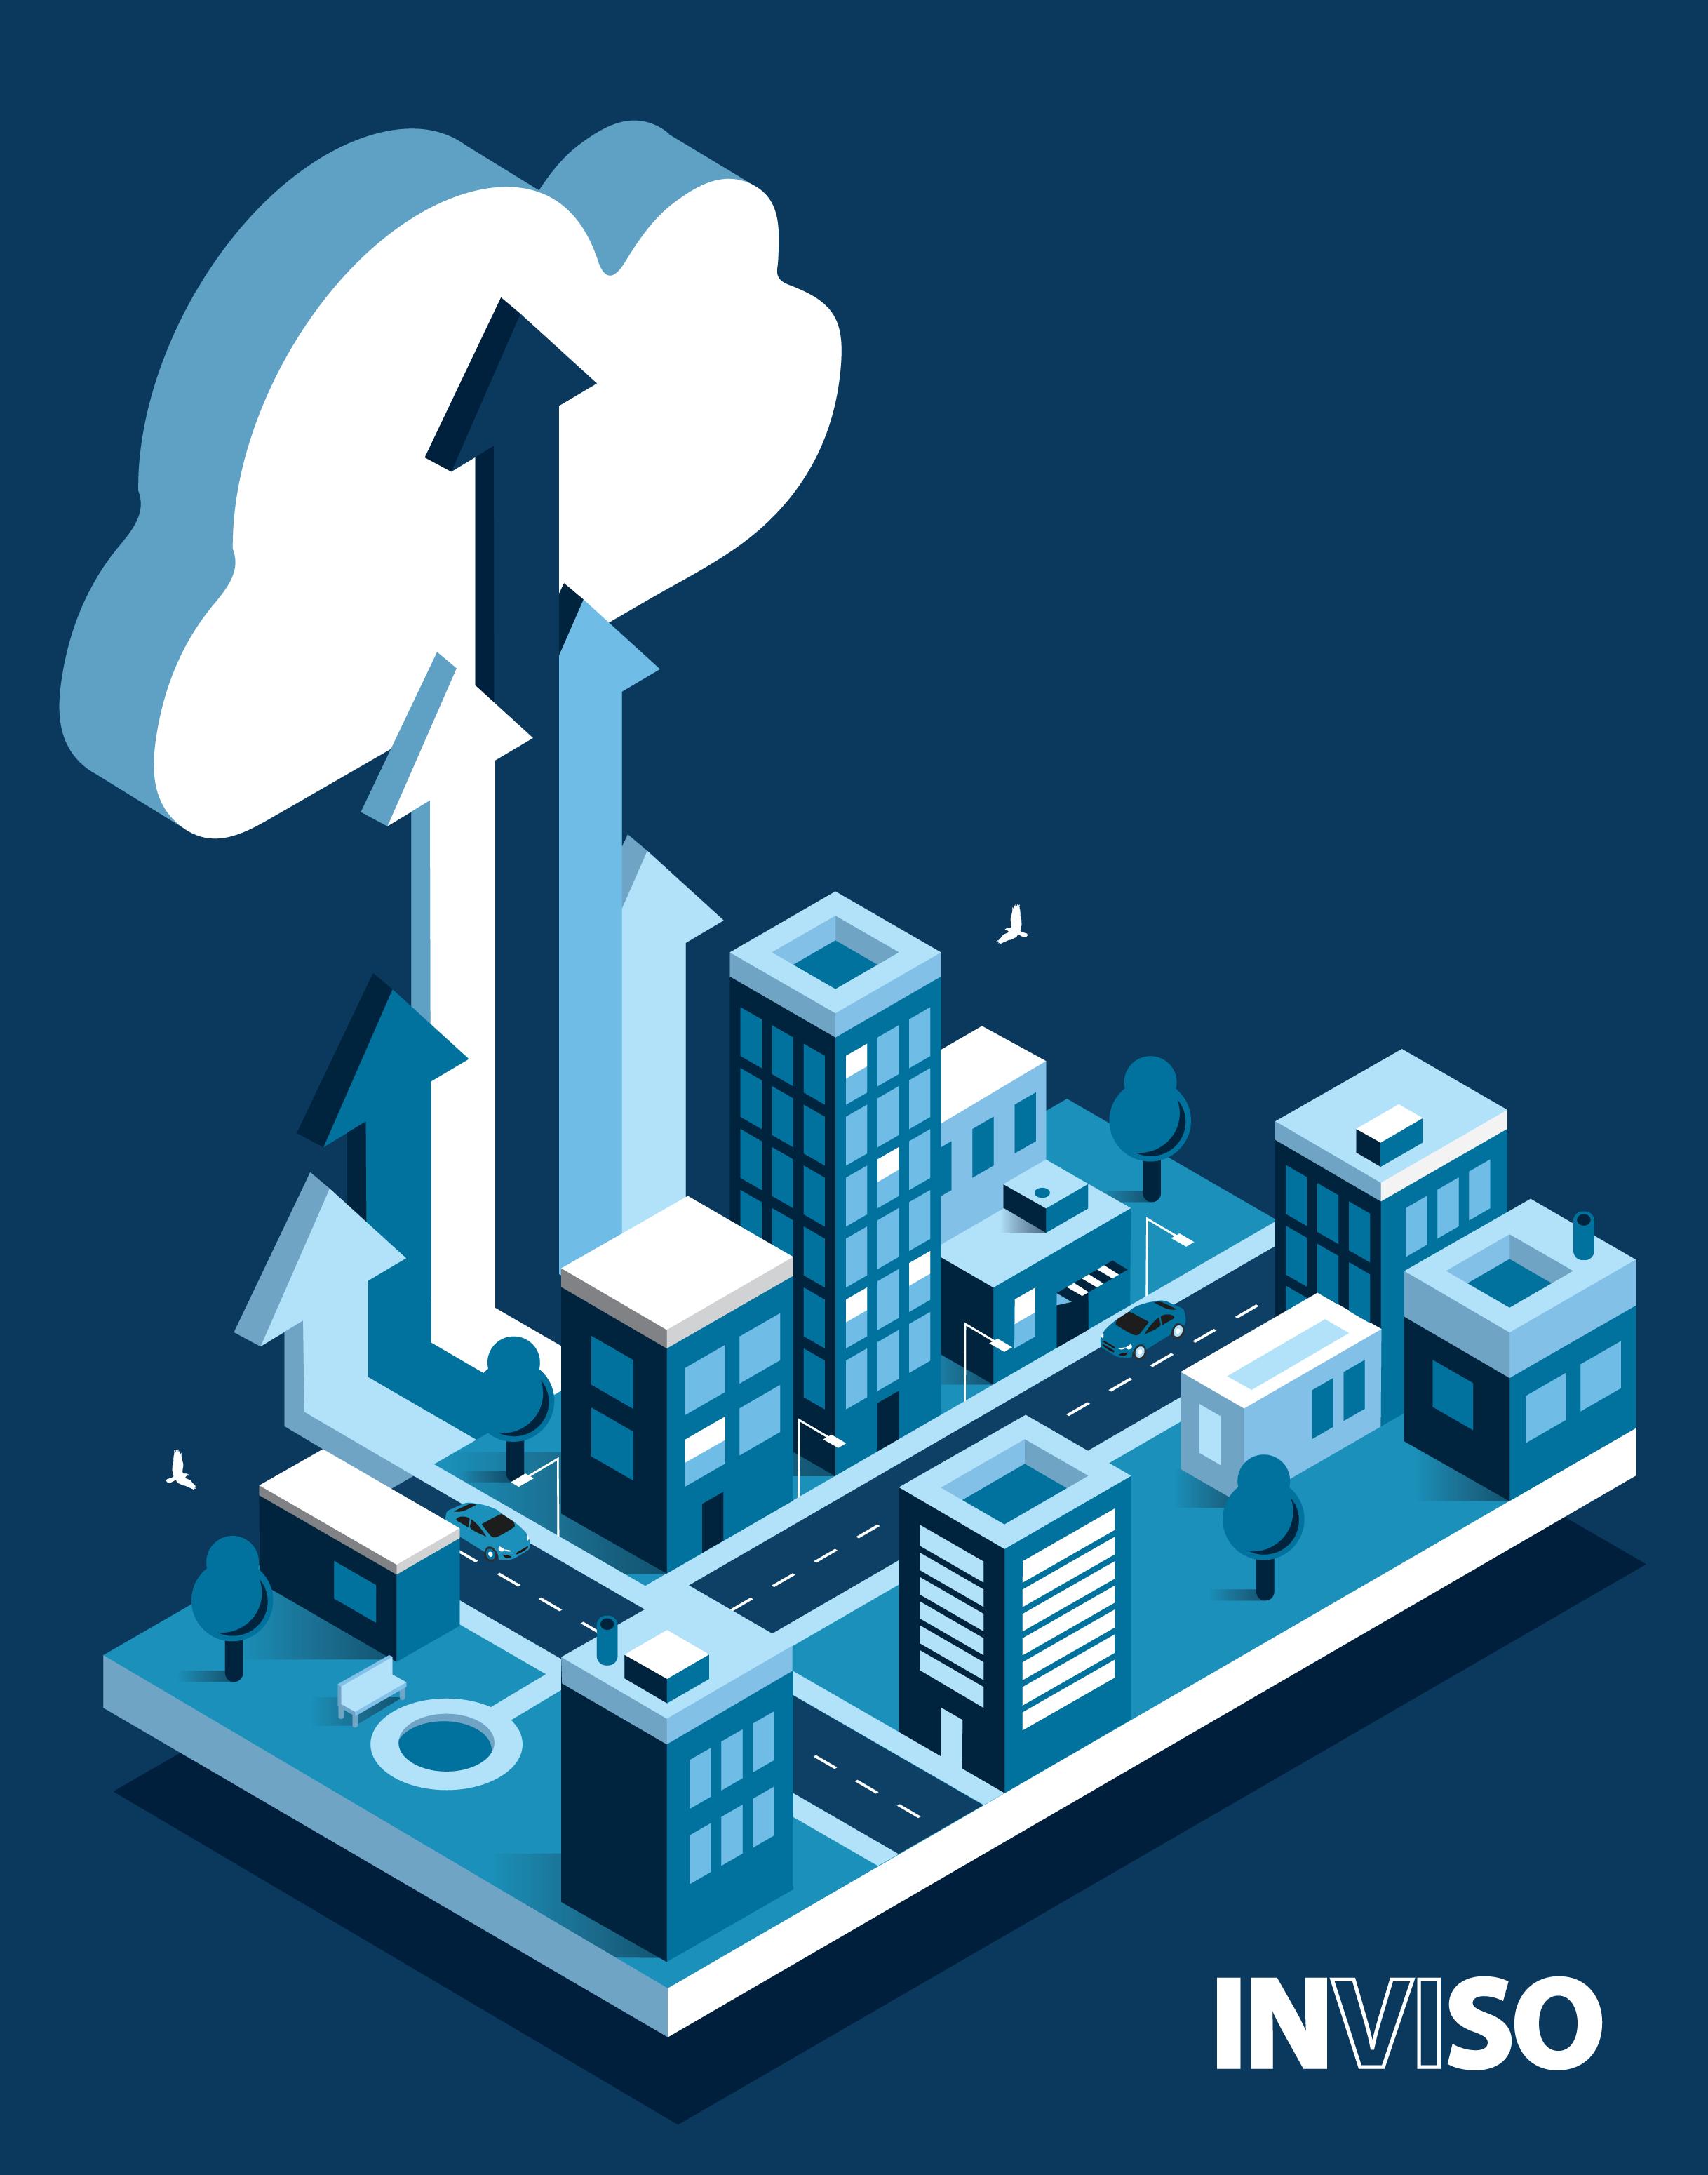 Cloud migration isometric city image